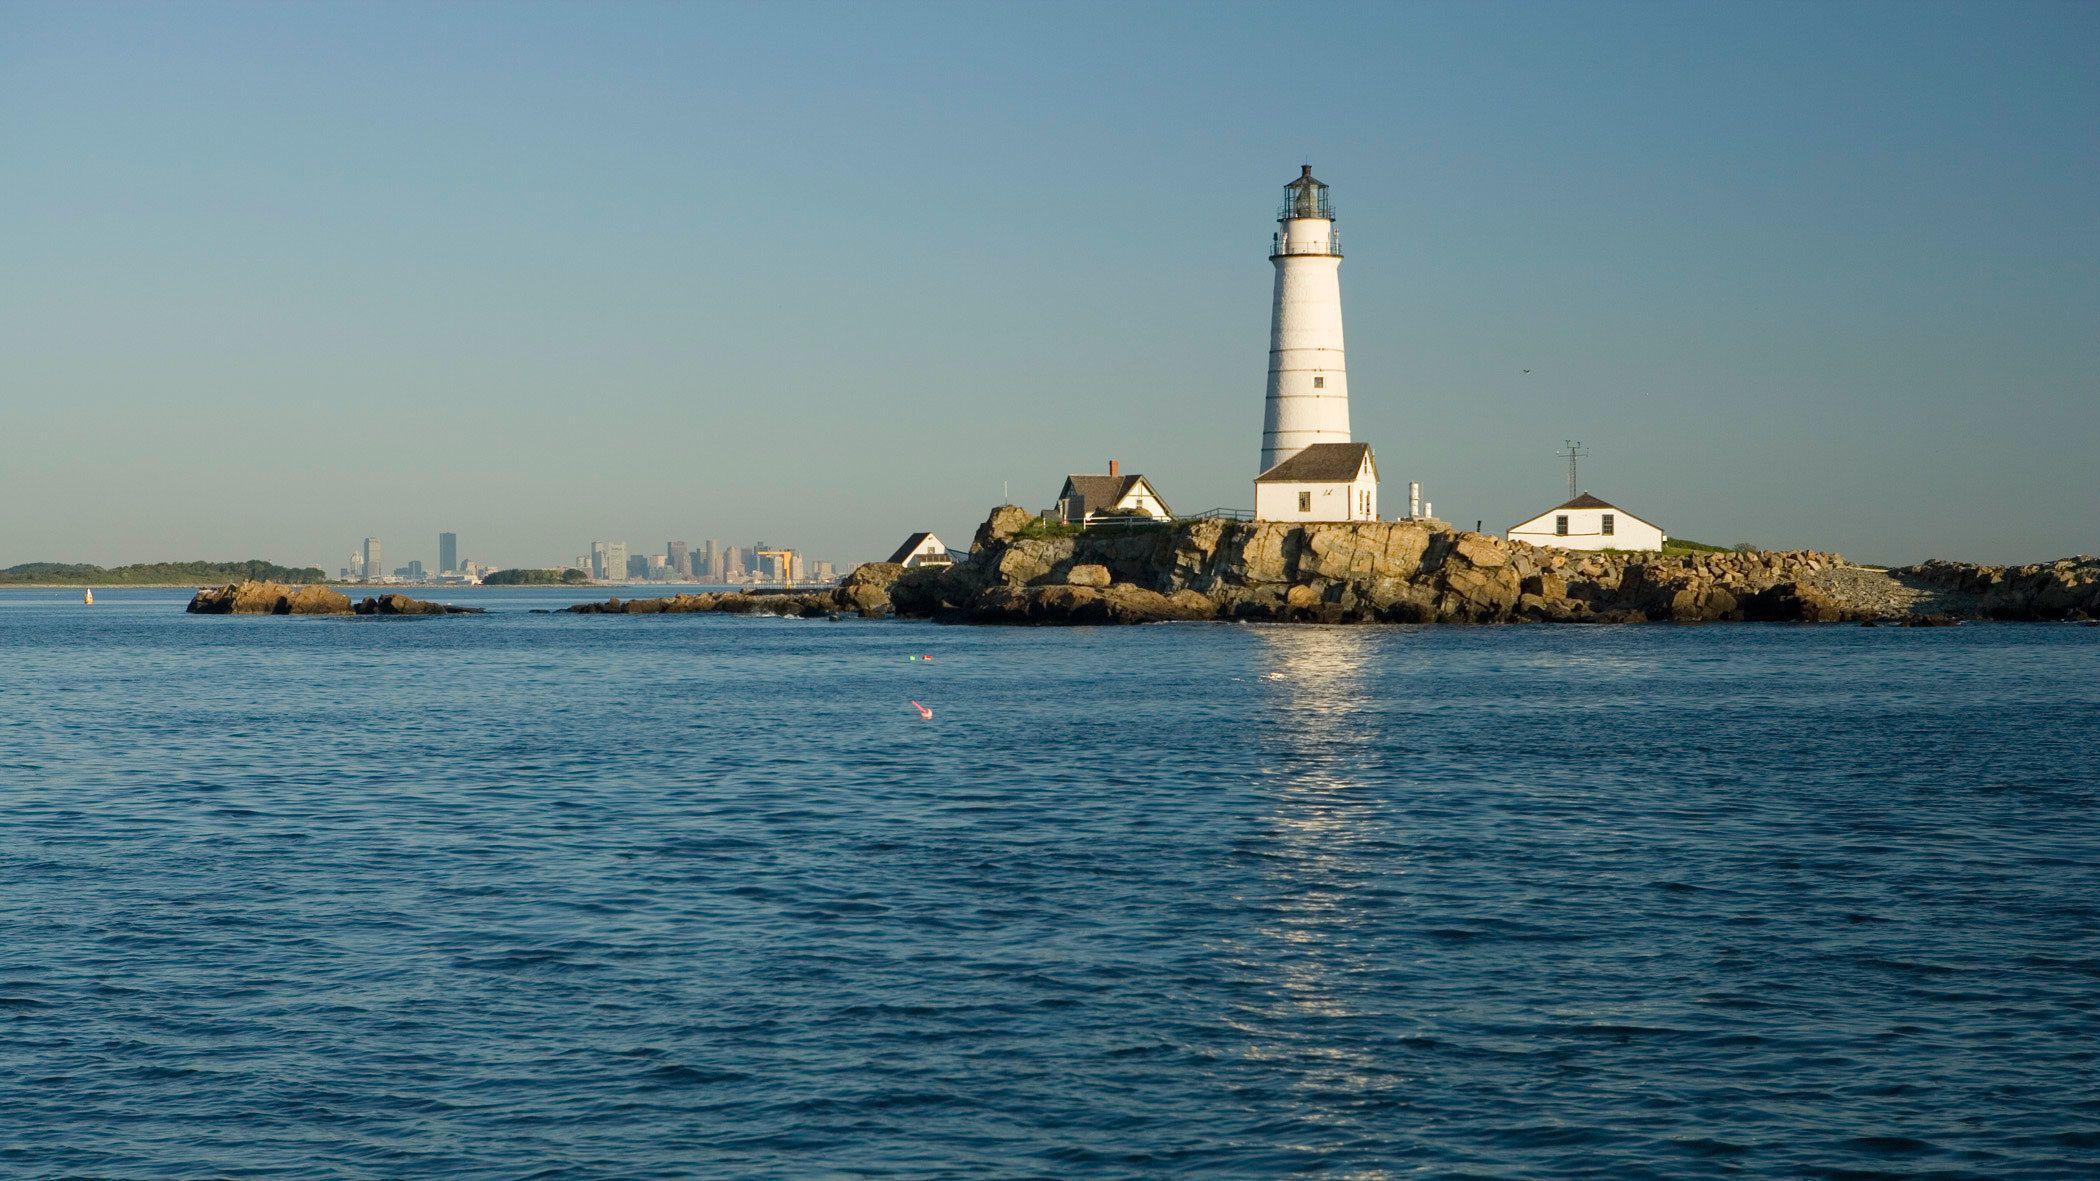 Boston Light on Little Brewster Island in Boston Harbor